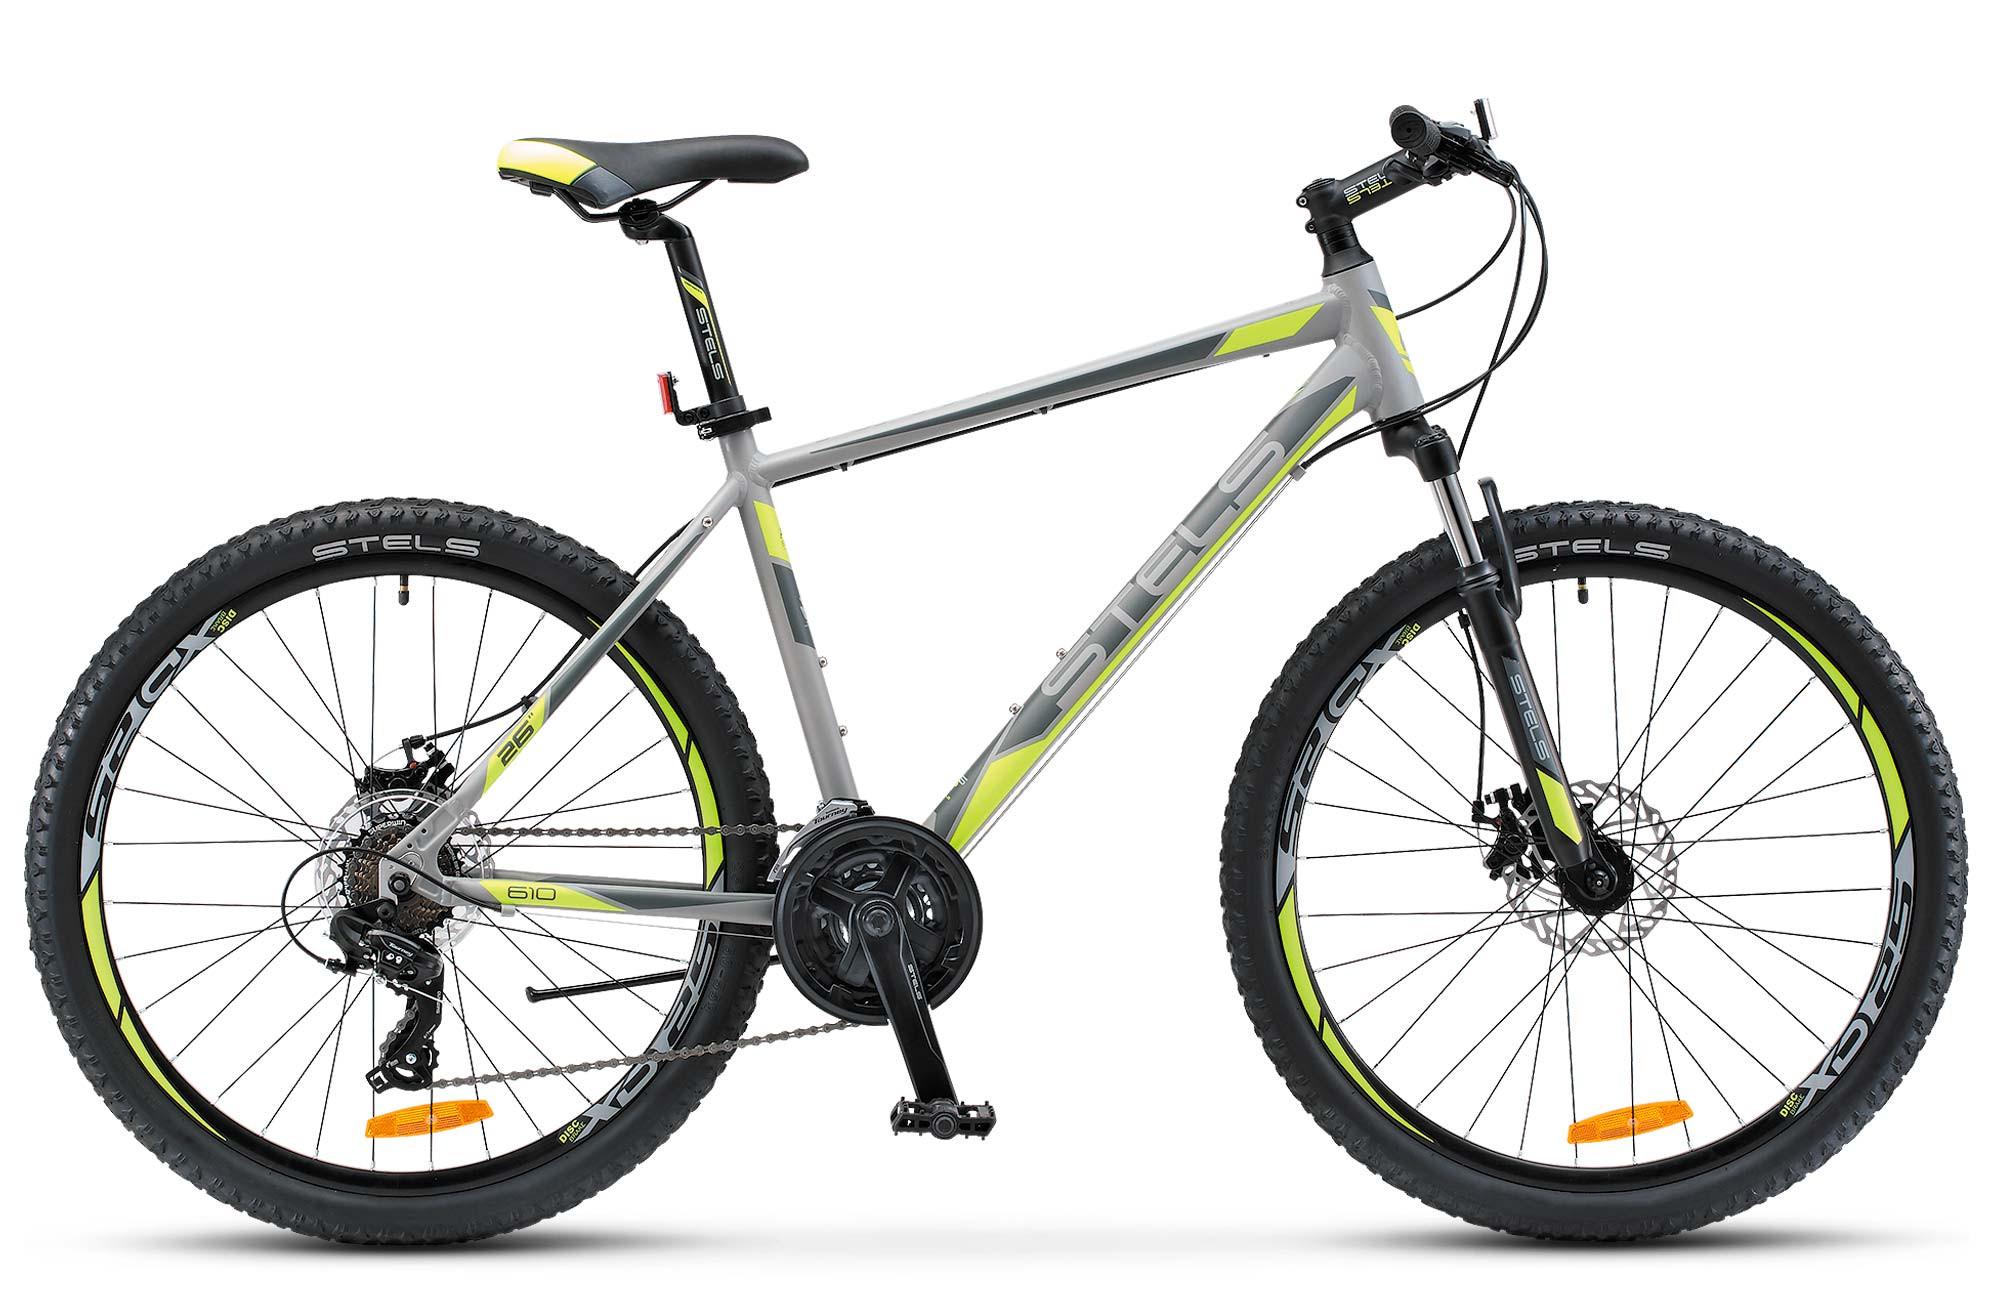 "Горный велосипед Stels Navigator-610MD 2017 V030 рама 16"" черный/салатовый"